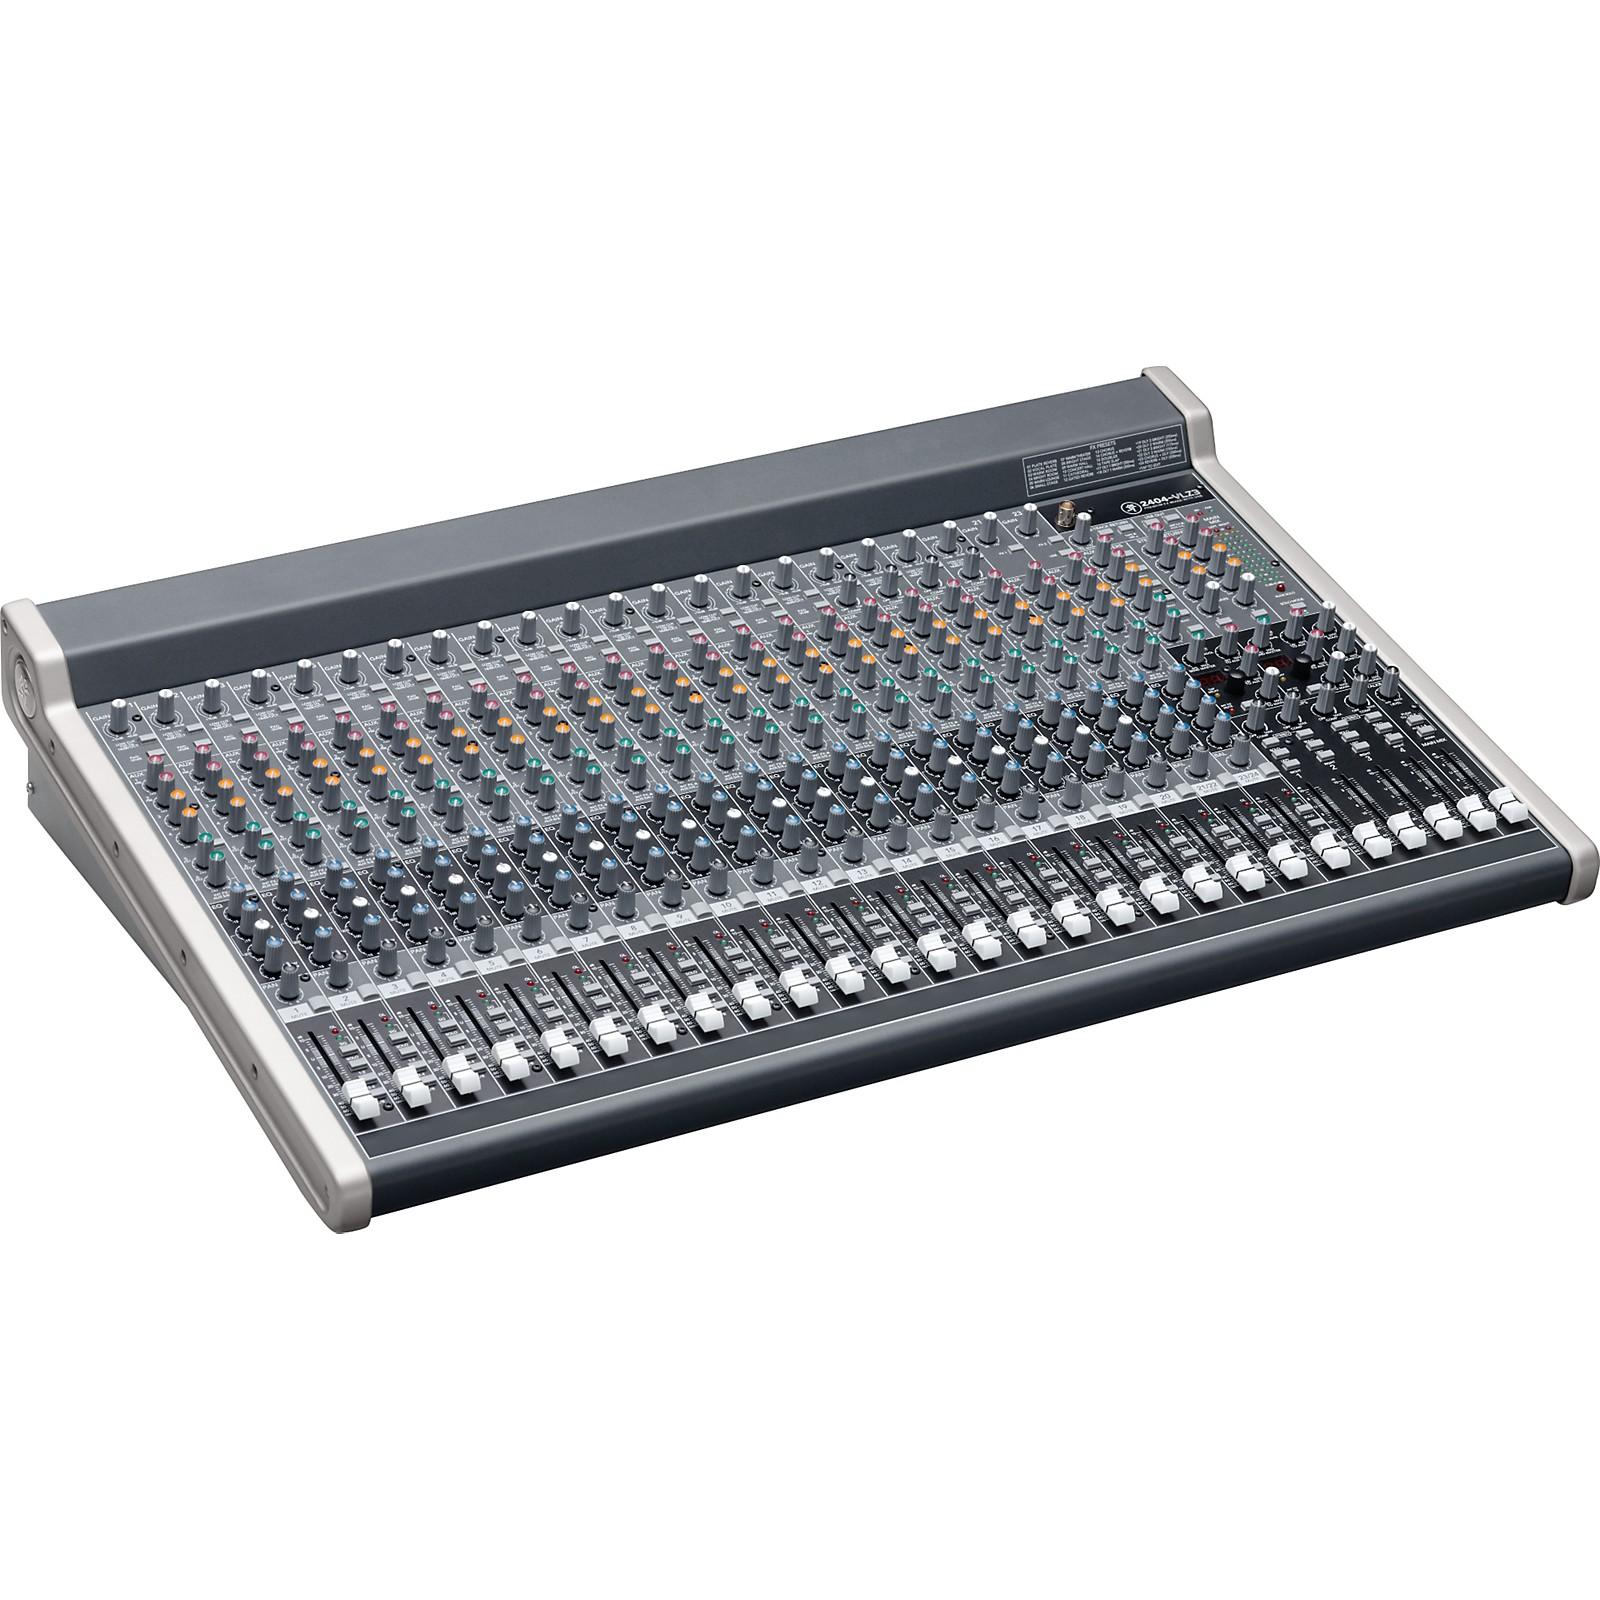 Mackie 2404-VLZ3 Premium 24-Channel FX Mixer with USB Black